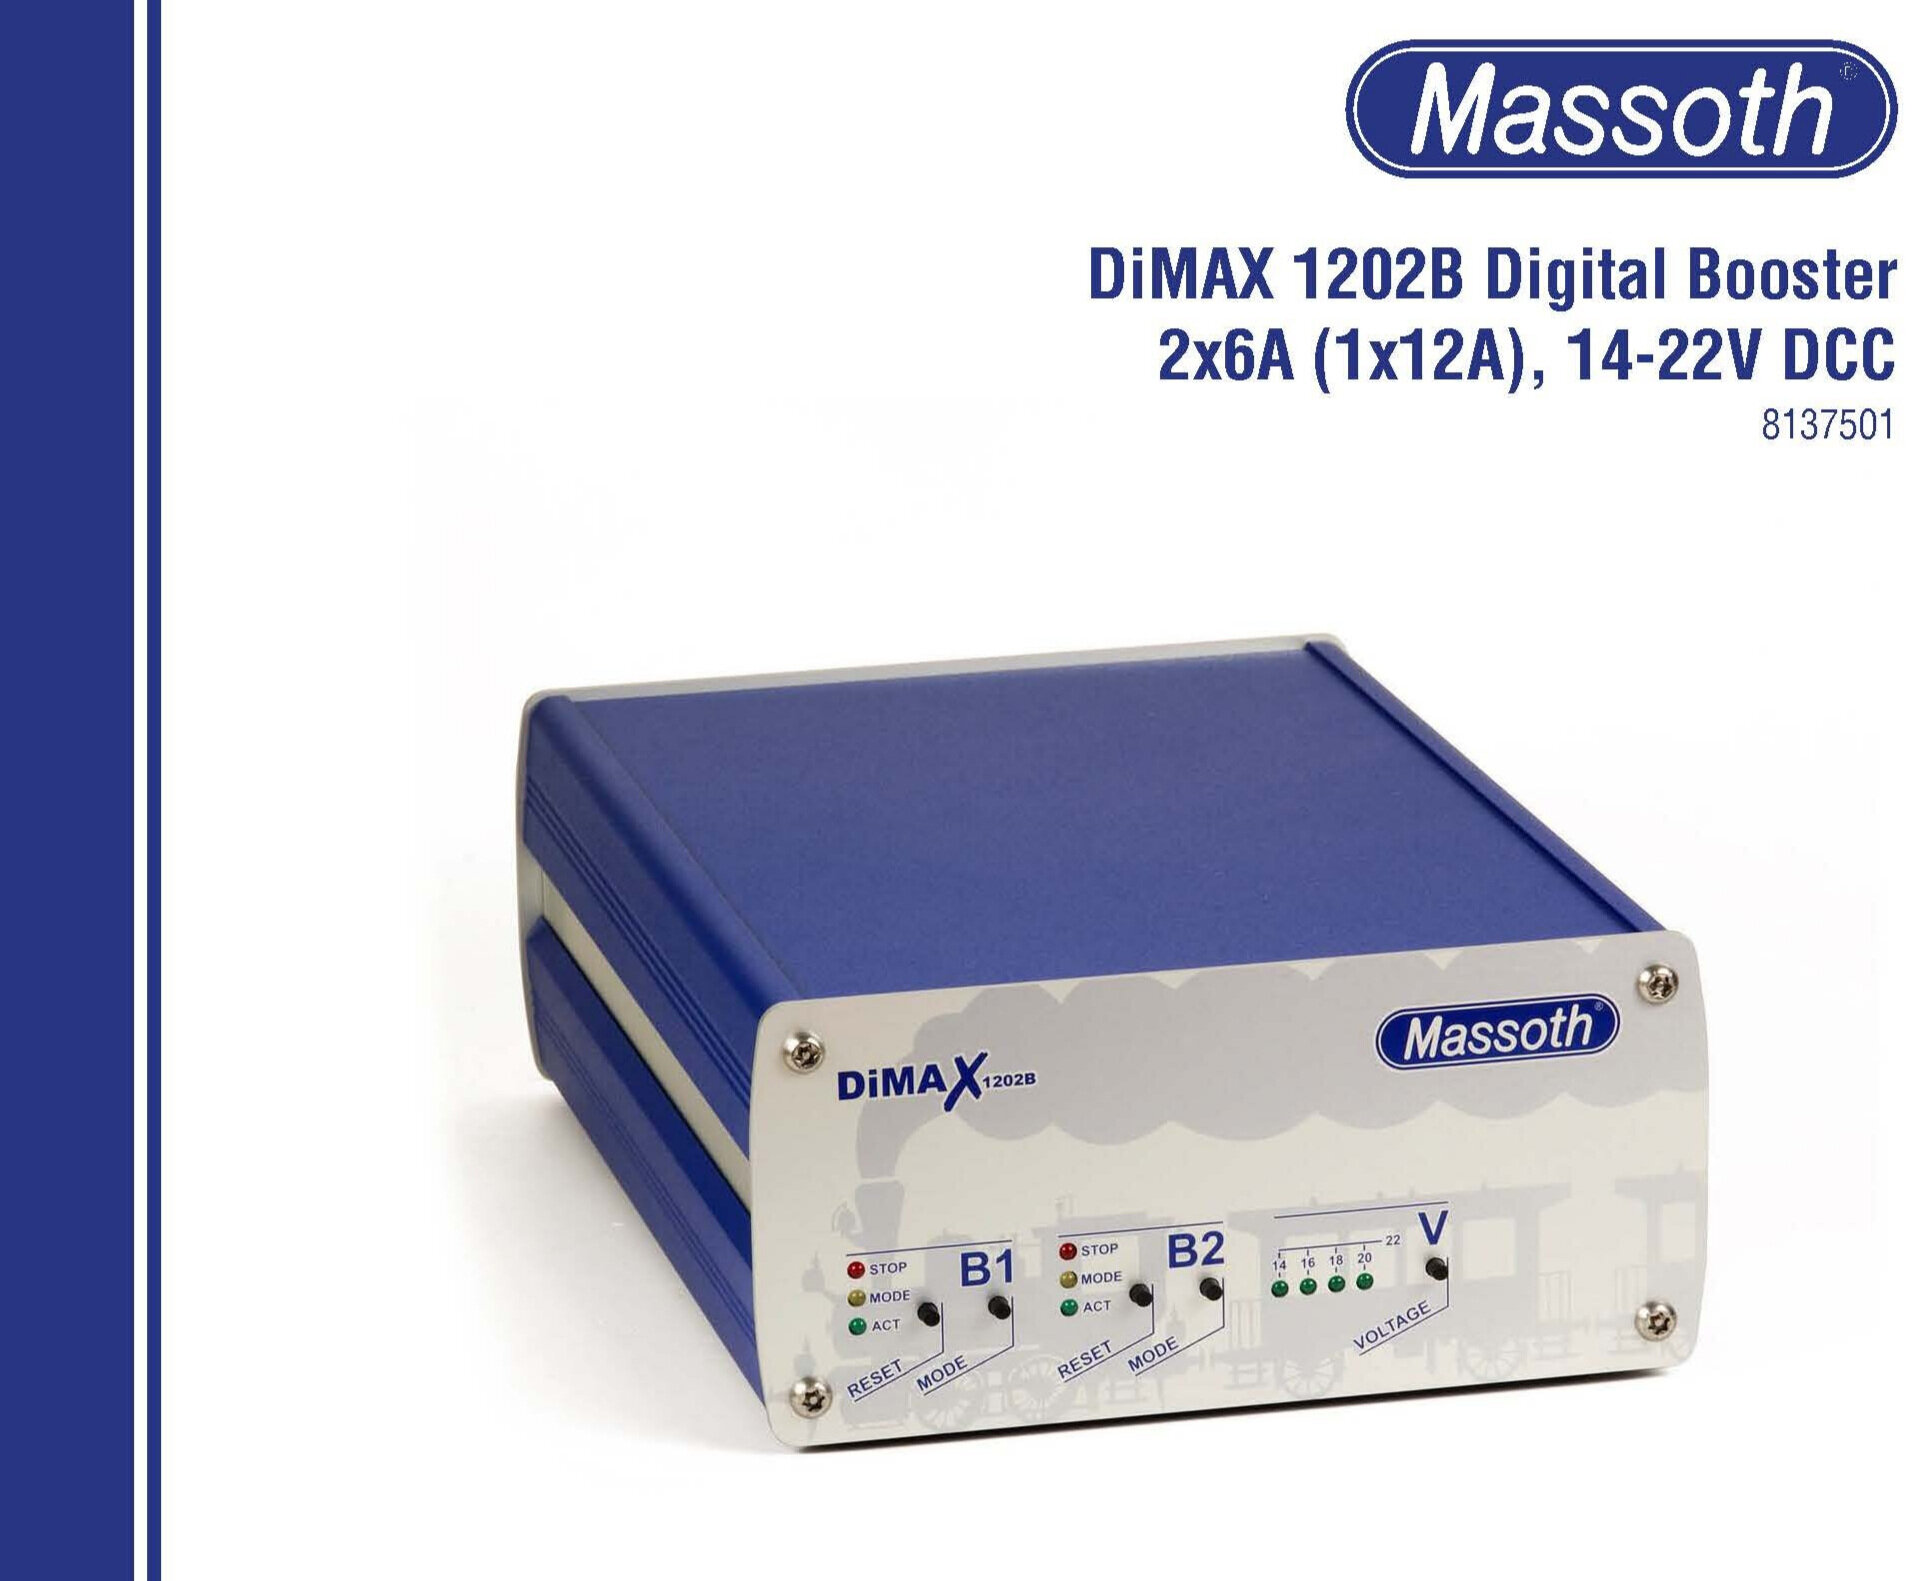 8137501 Massoth DiMax 1202B Digital Booster User's Manual 19-08